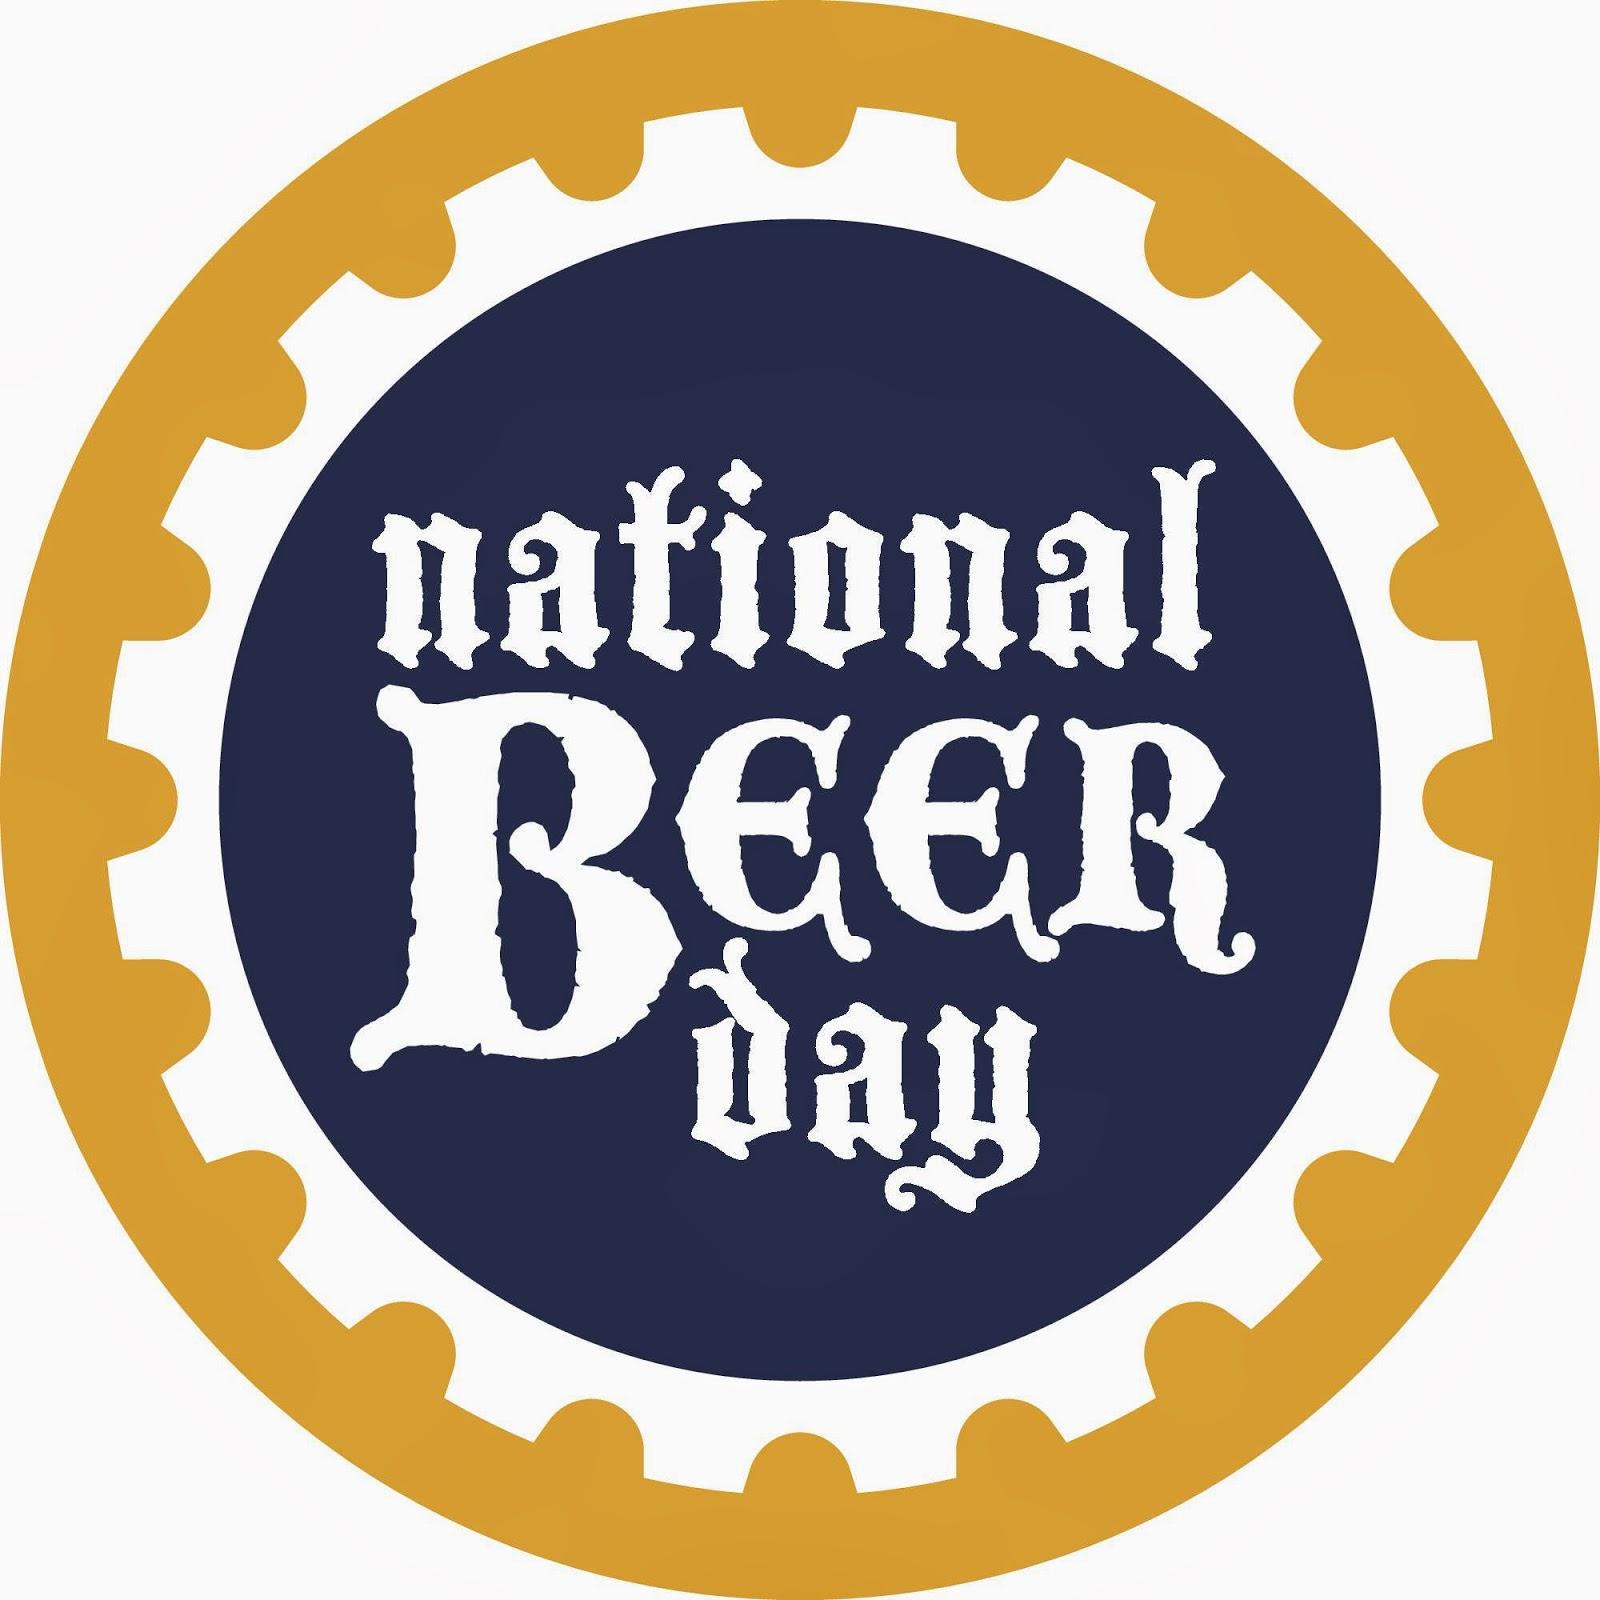 National_Beer_Day 2.jpg